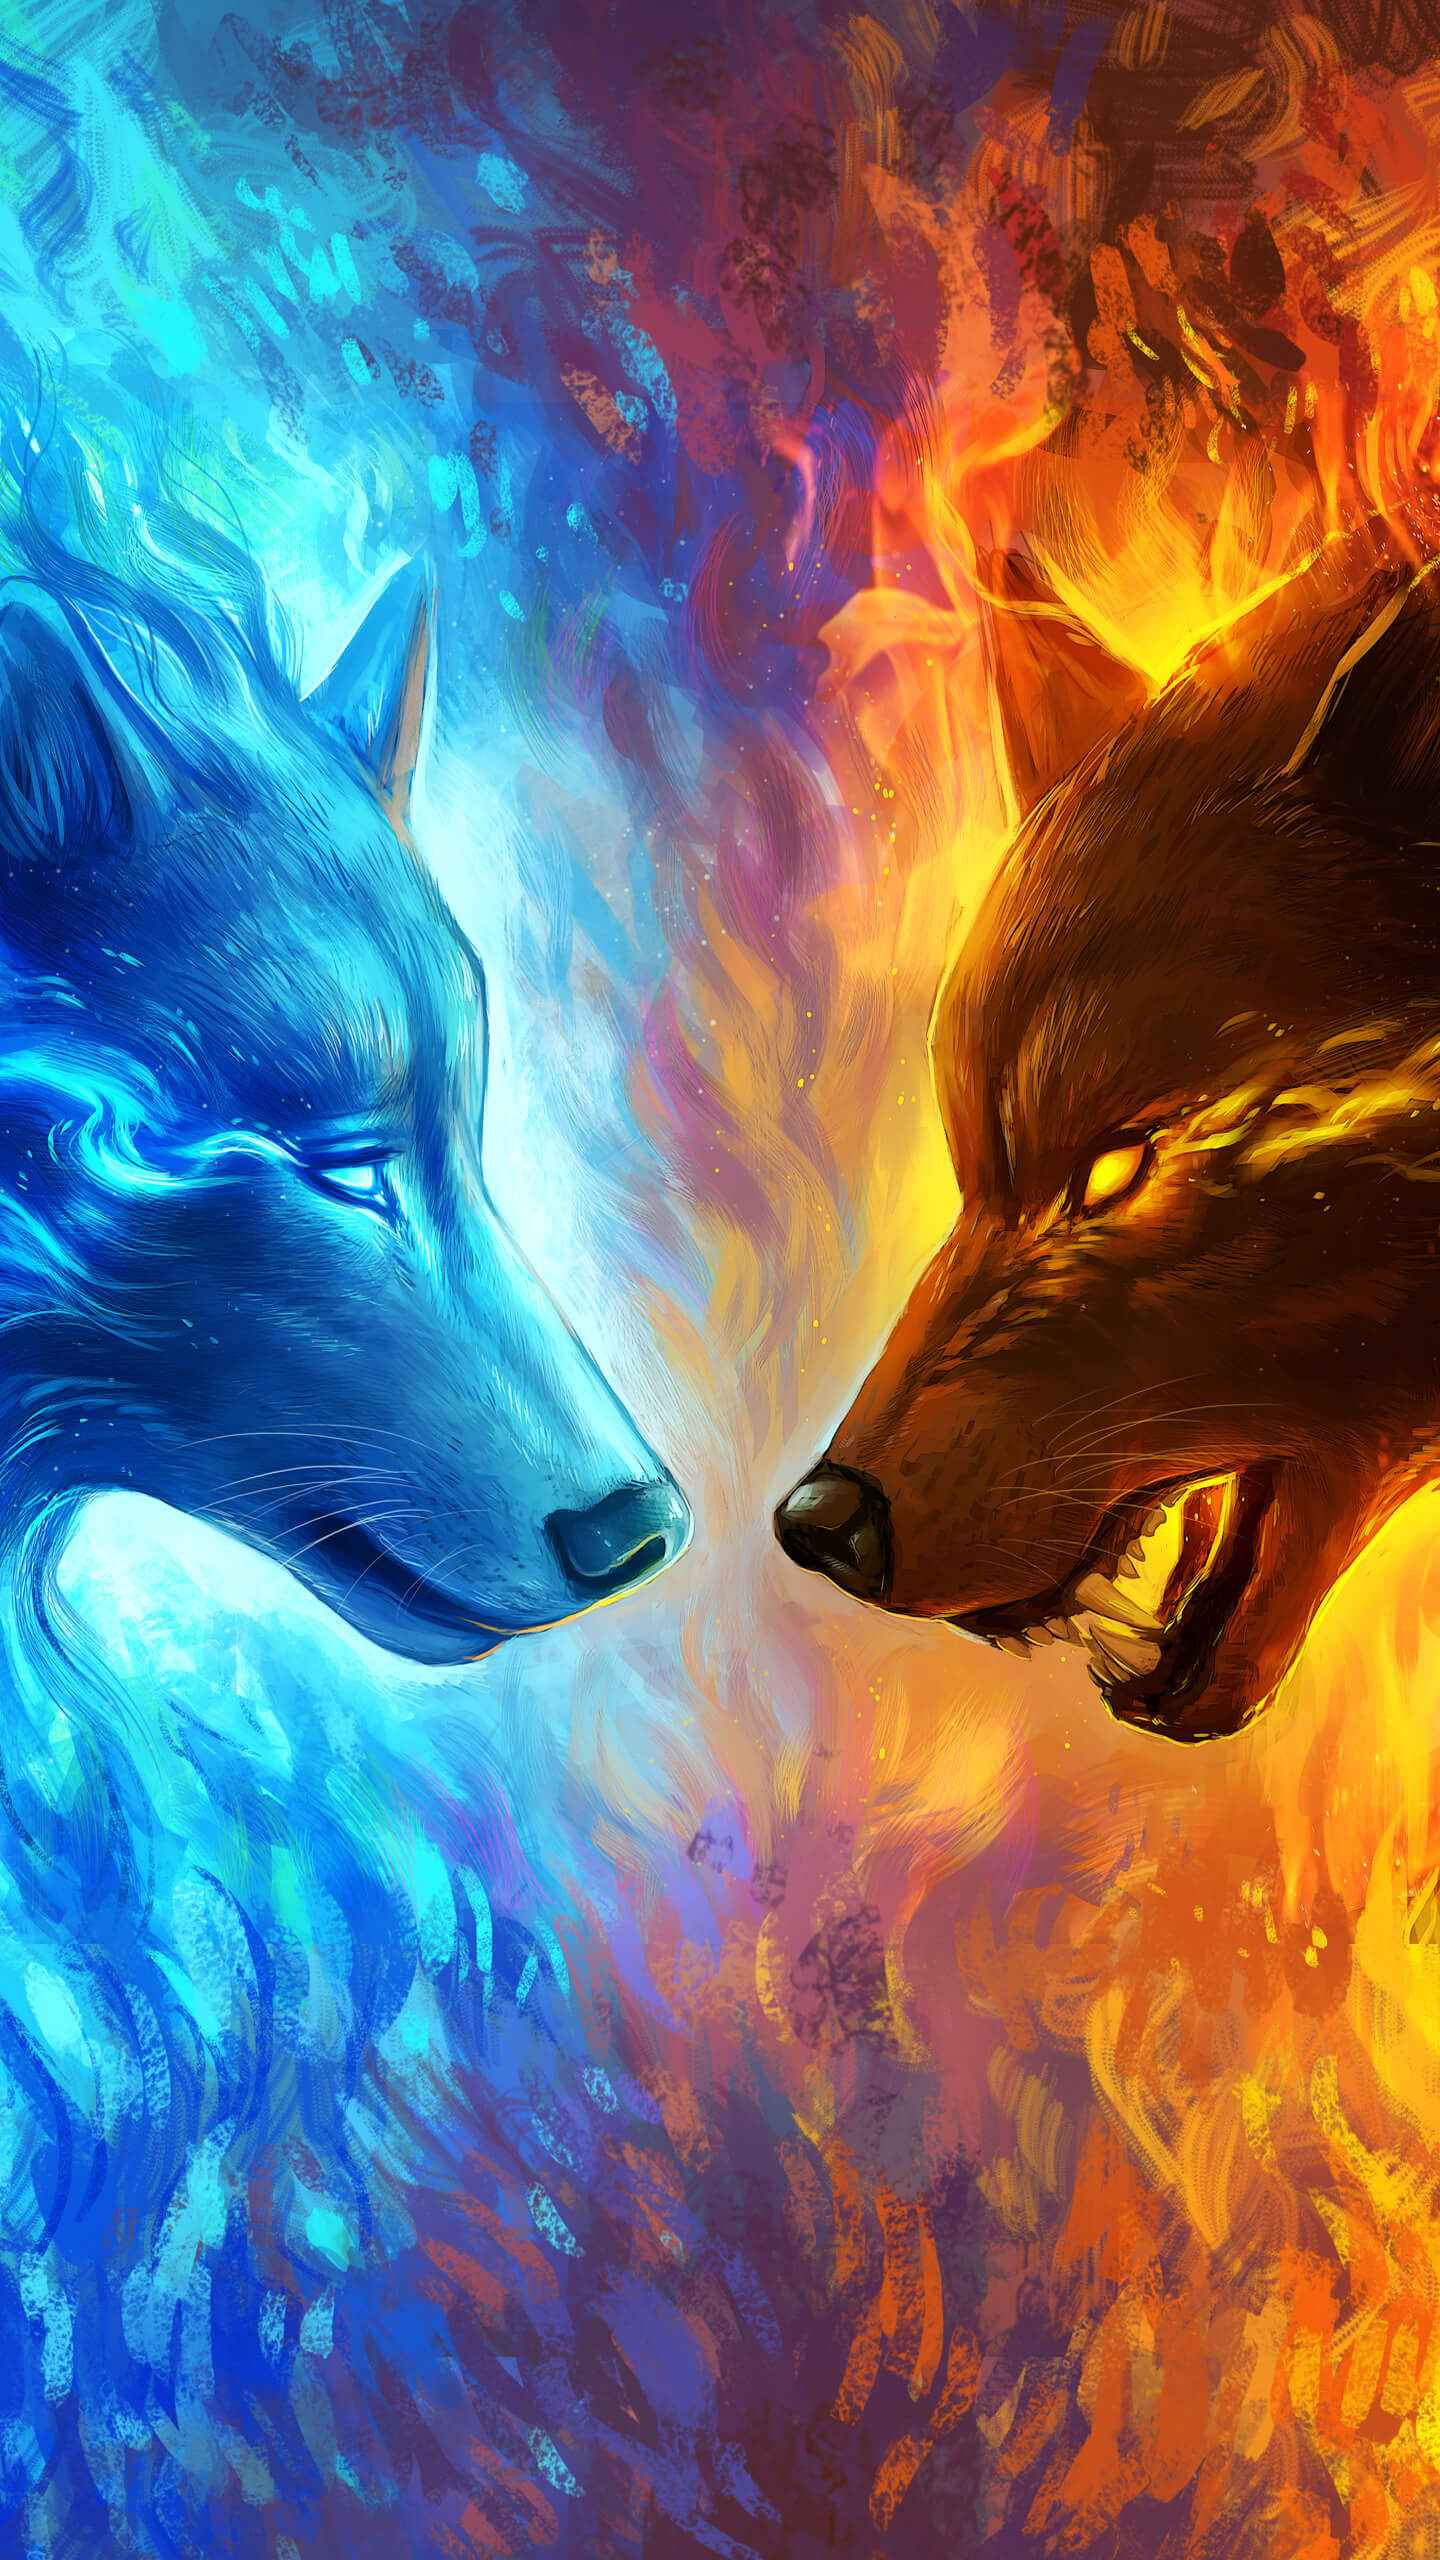 Alpha Luna Wolf 414662 Hd Wallpaper Backgrounds Download